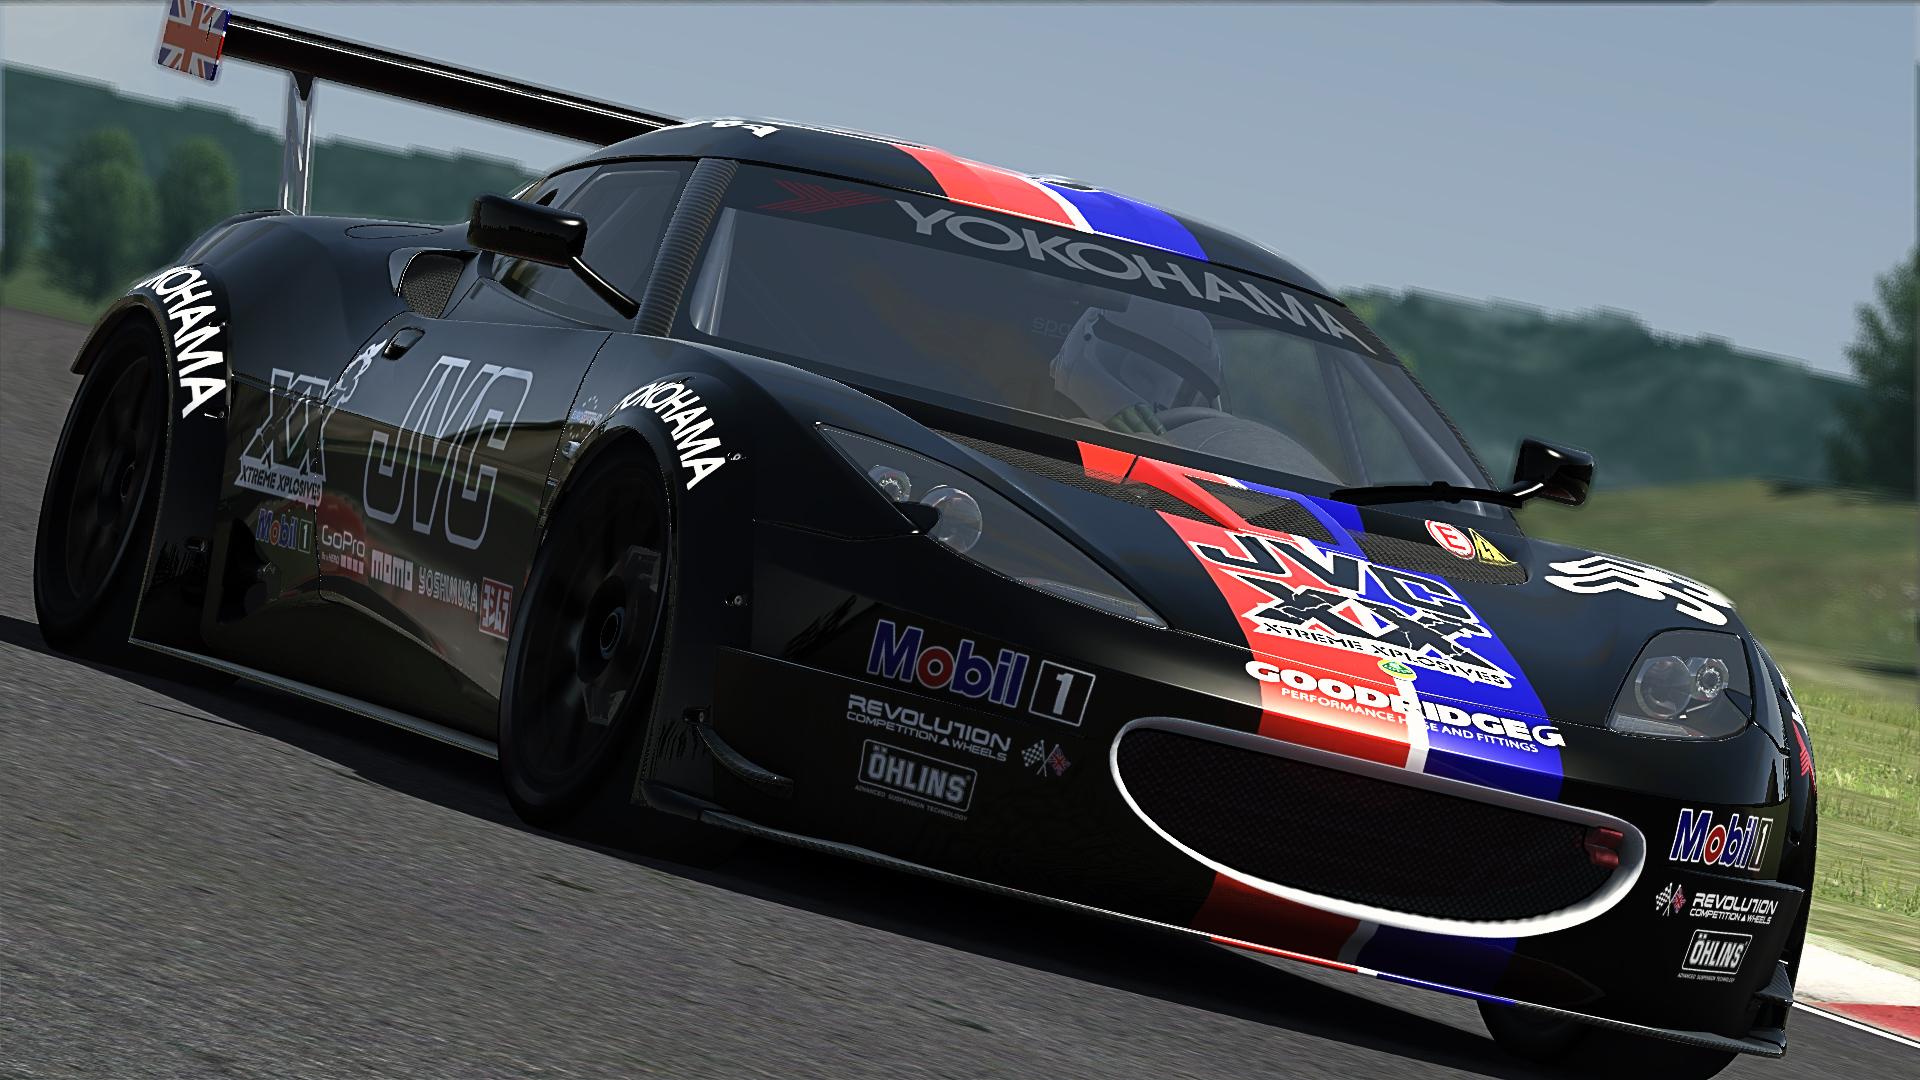 JVC Lotus Evora GTC